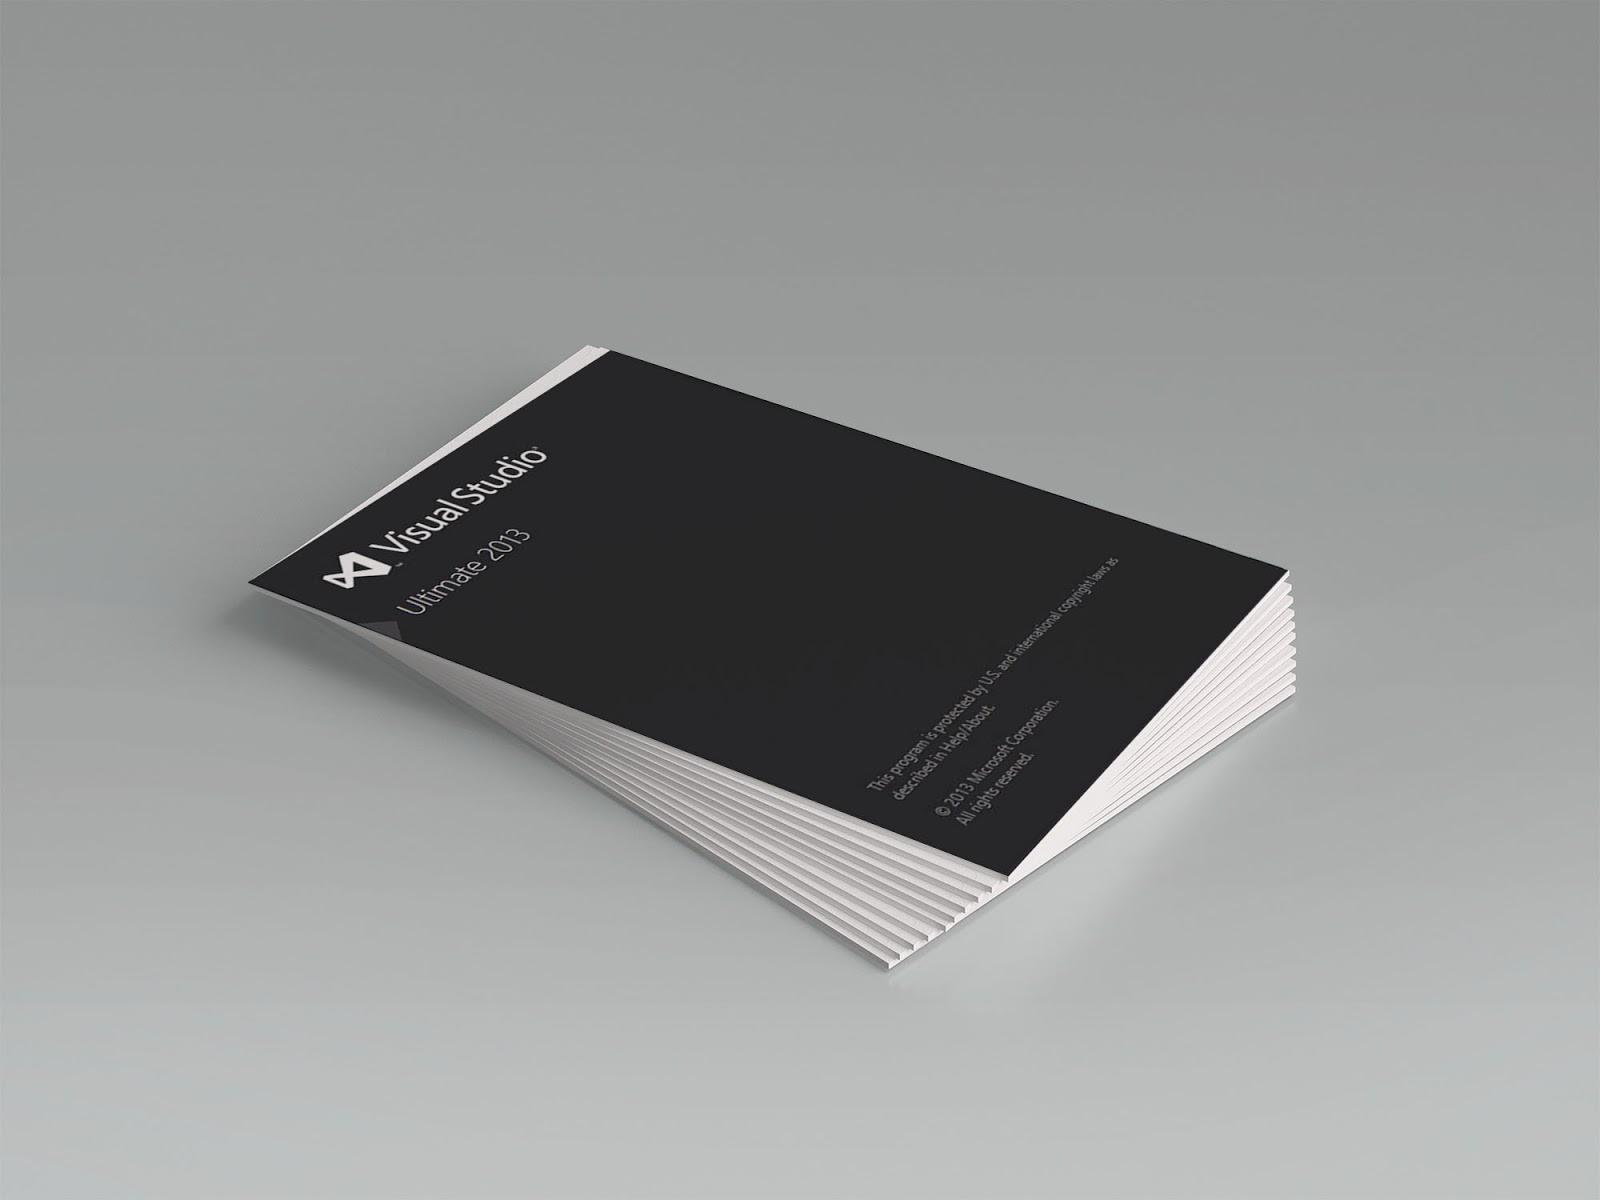 Visual Basic 2013 Ultimate